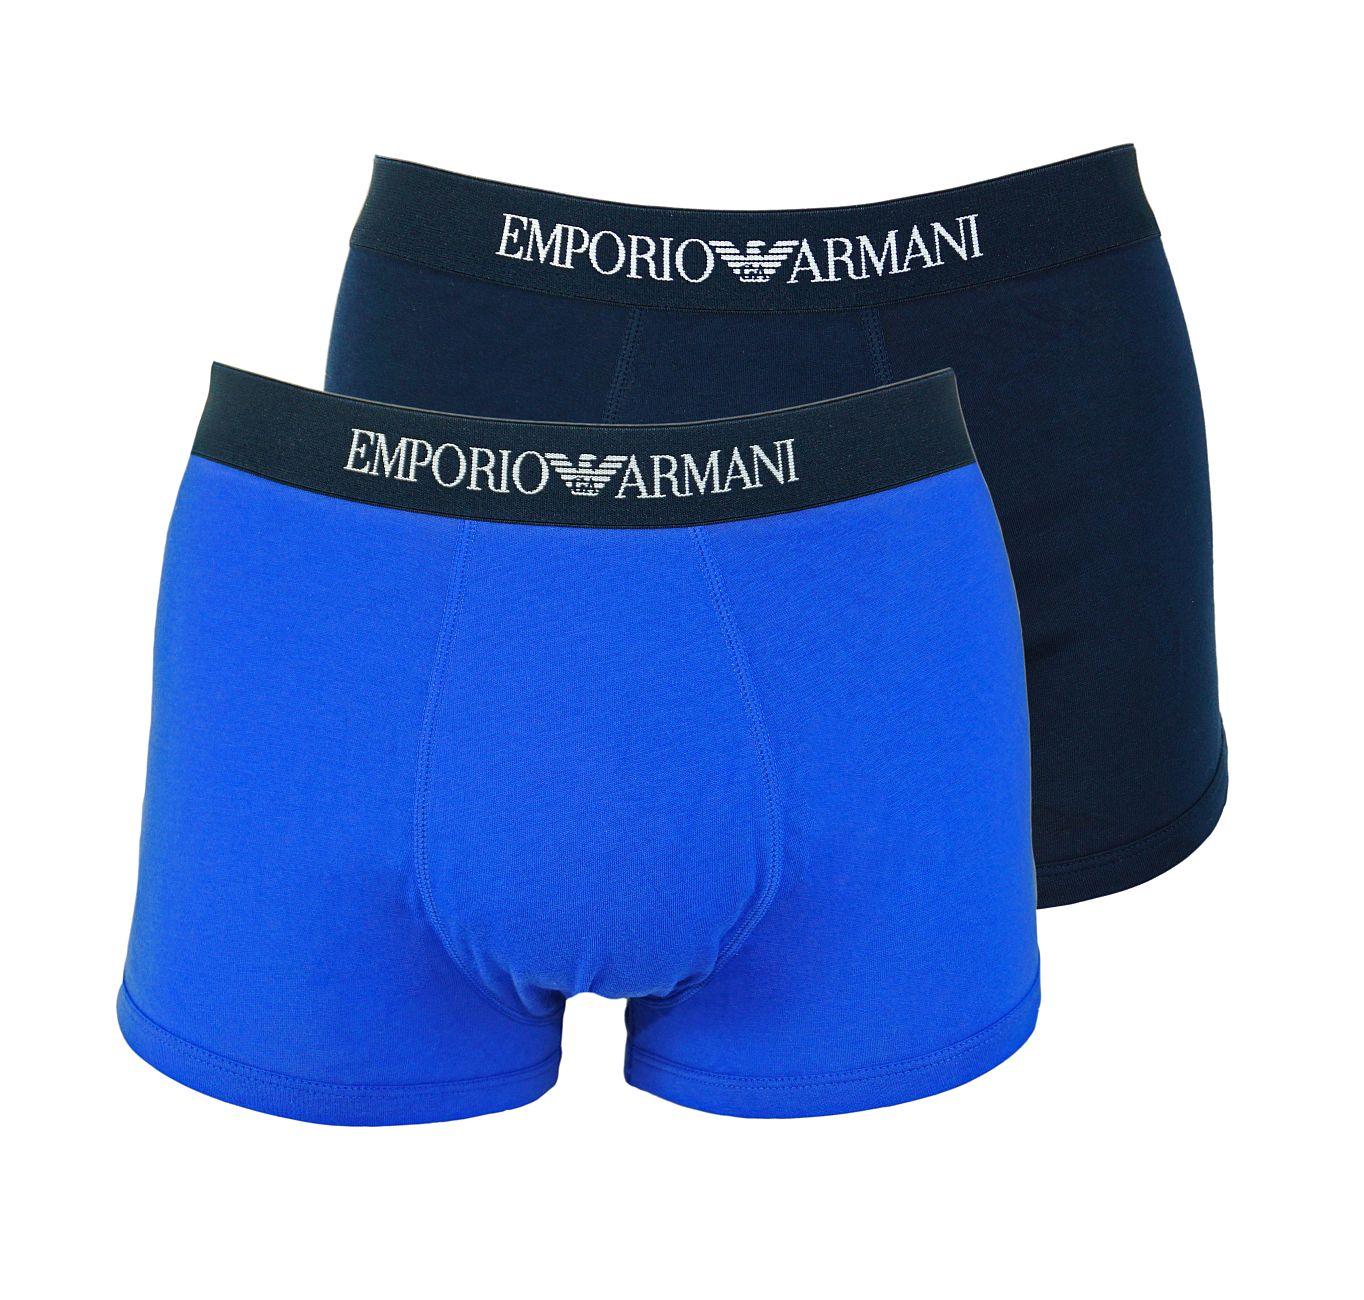 Emporio Armani 2er Pack Trunk Shorts 111613 8P722 50035 MARINE/ULTRAMARINE F18-EAT1